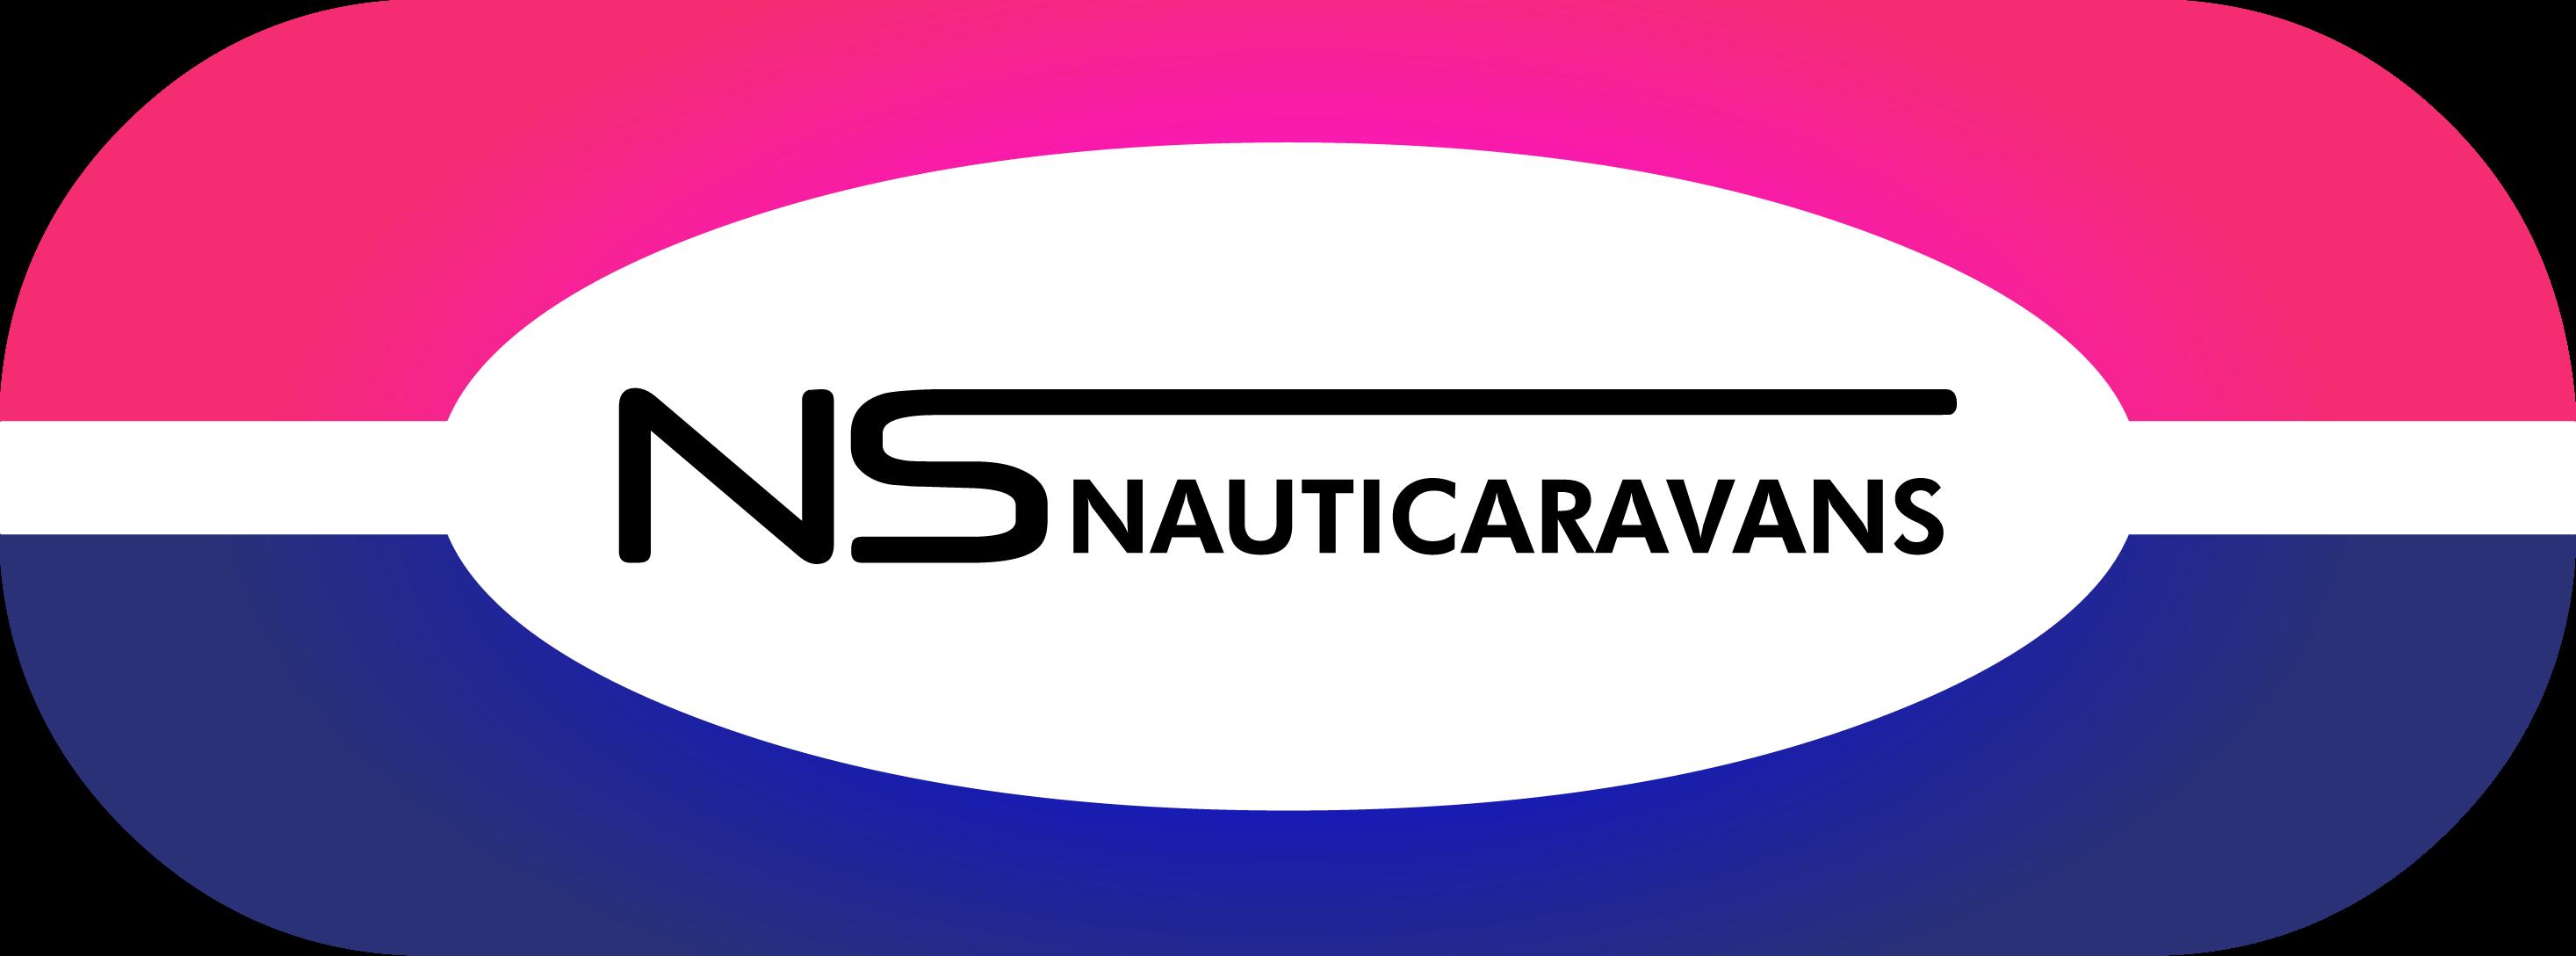 NSnauticaravans